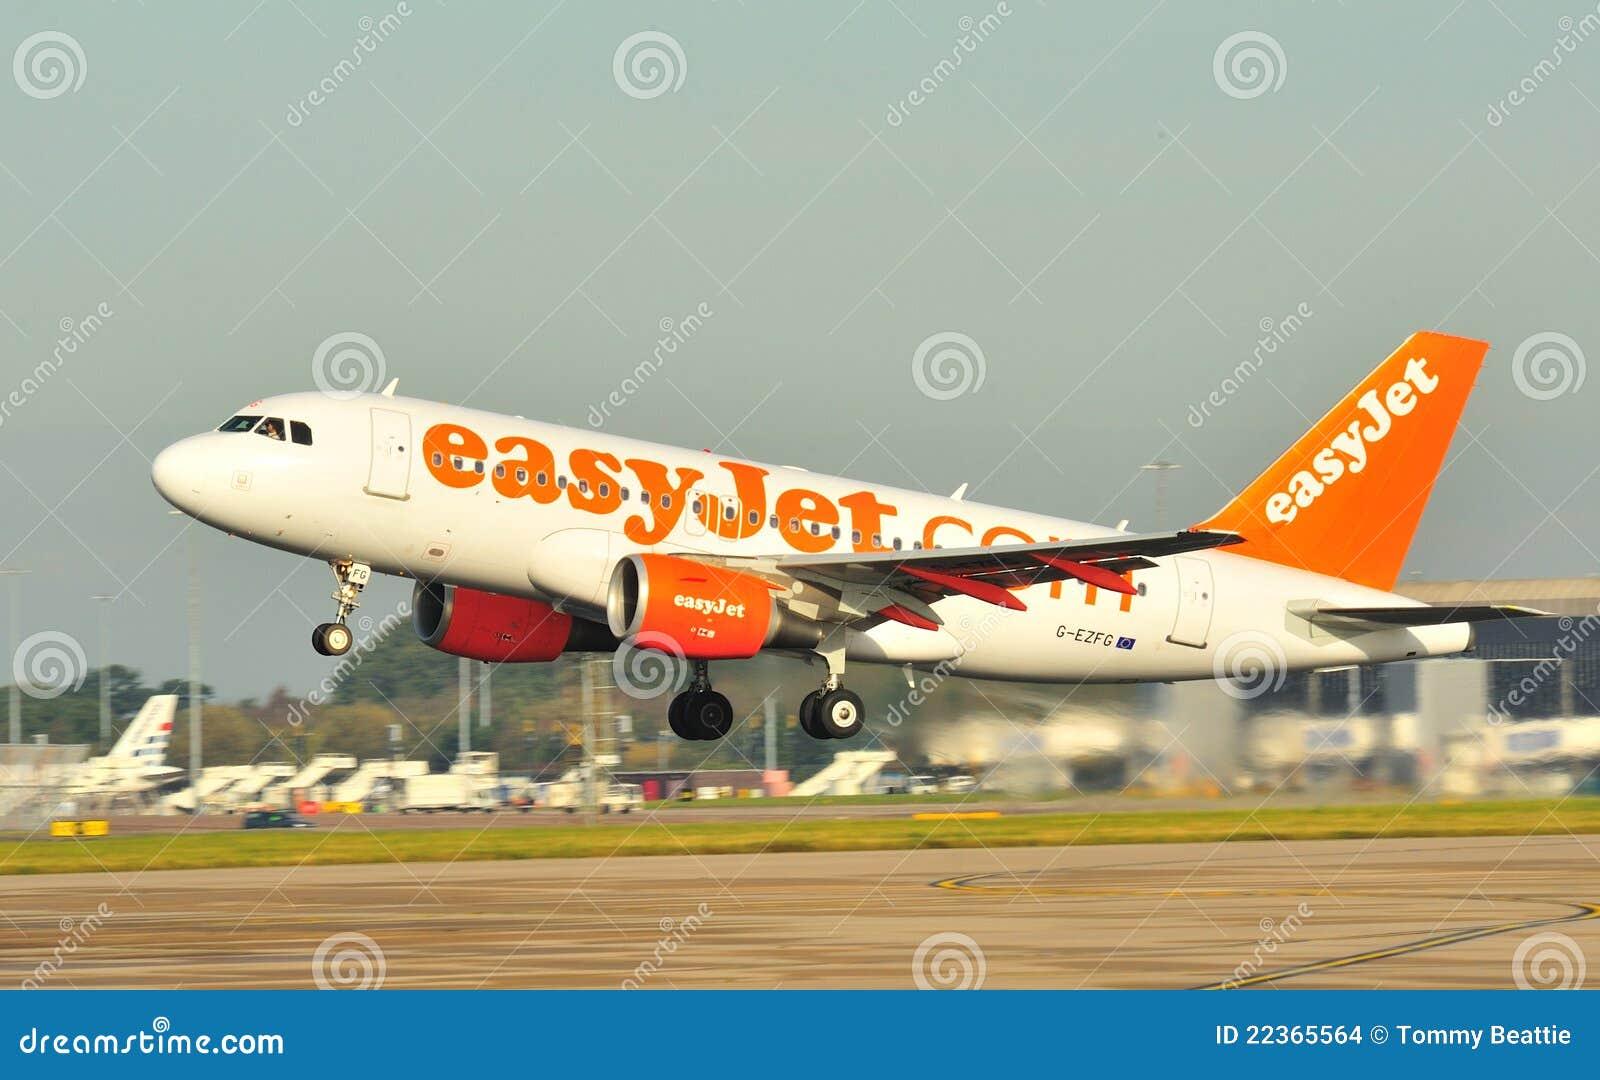 Easyjet Airbus A319